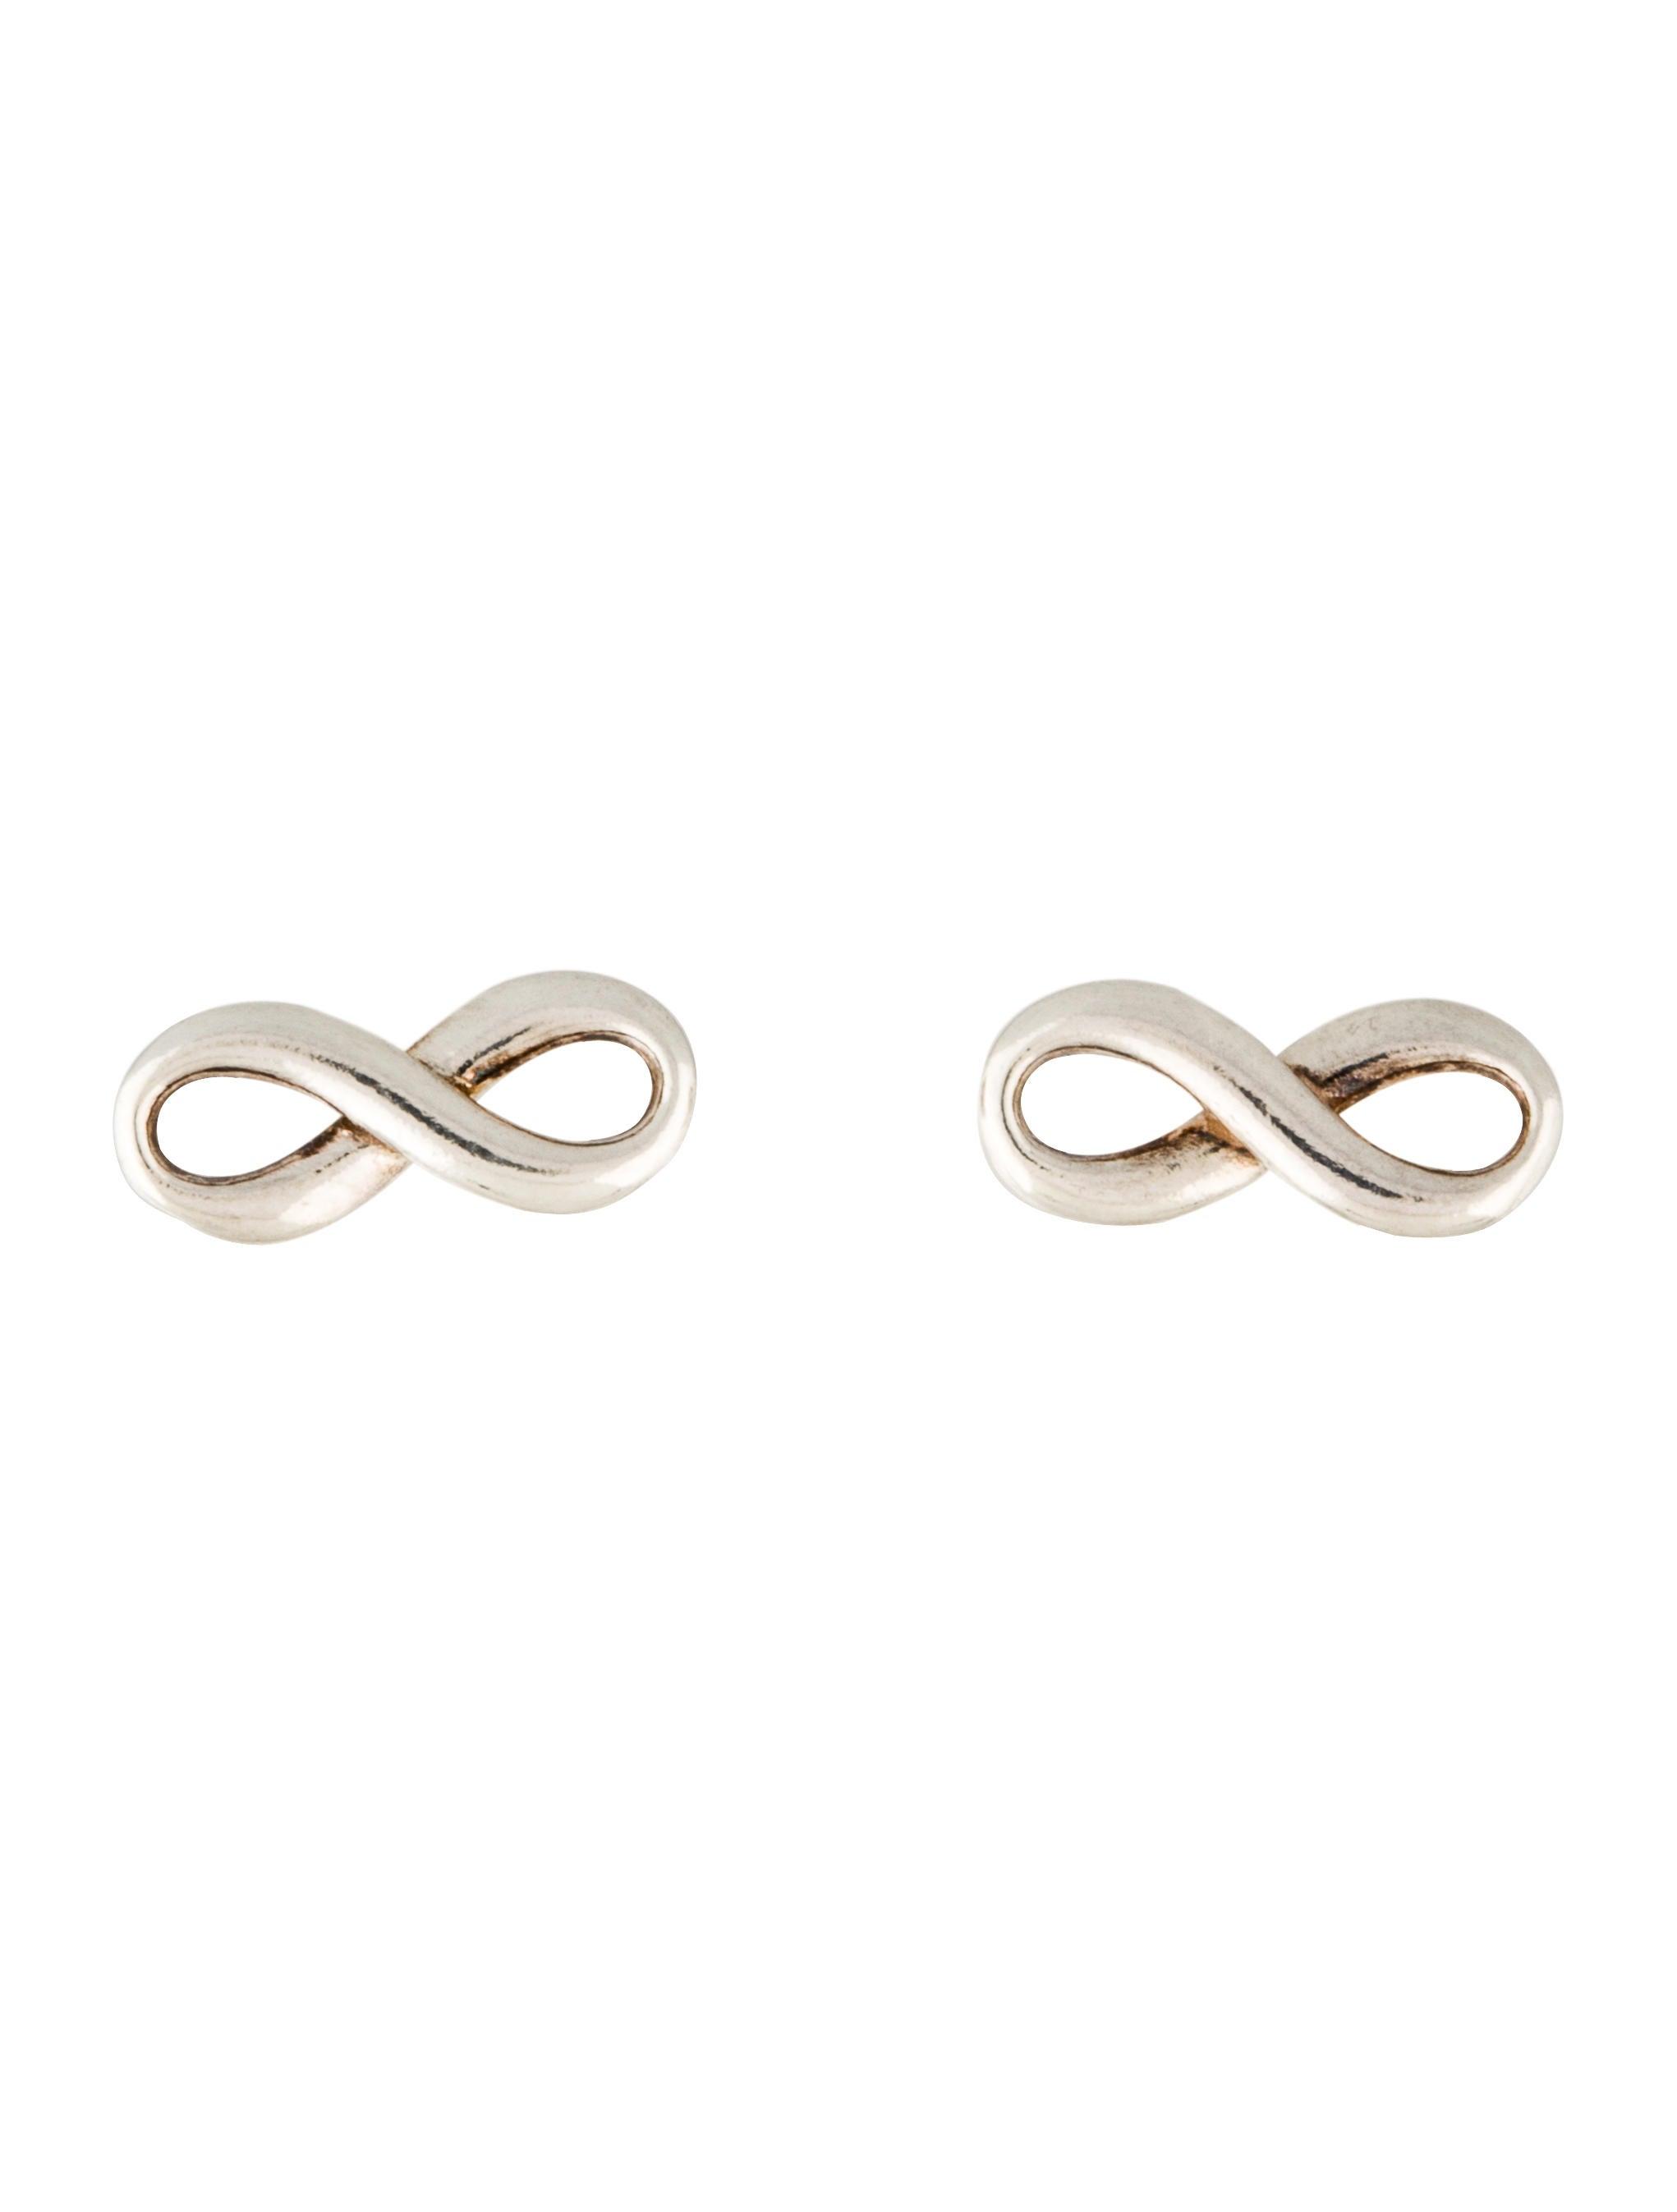 082ac6160 Tiffany & Co. Infinity Earrings - Earrings - TIF57514 | The RealReal